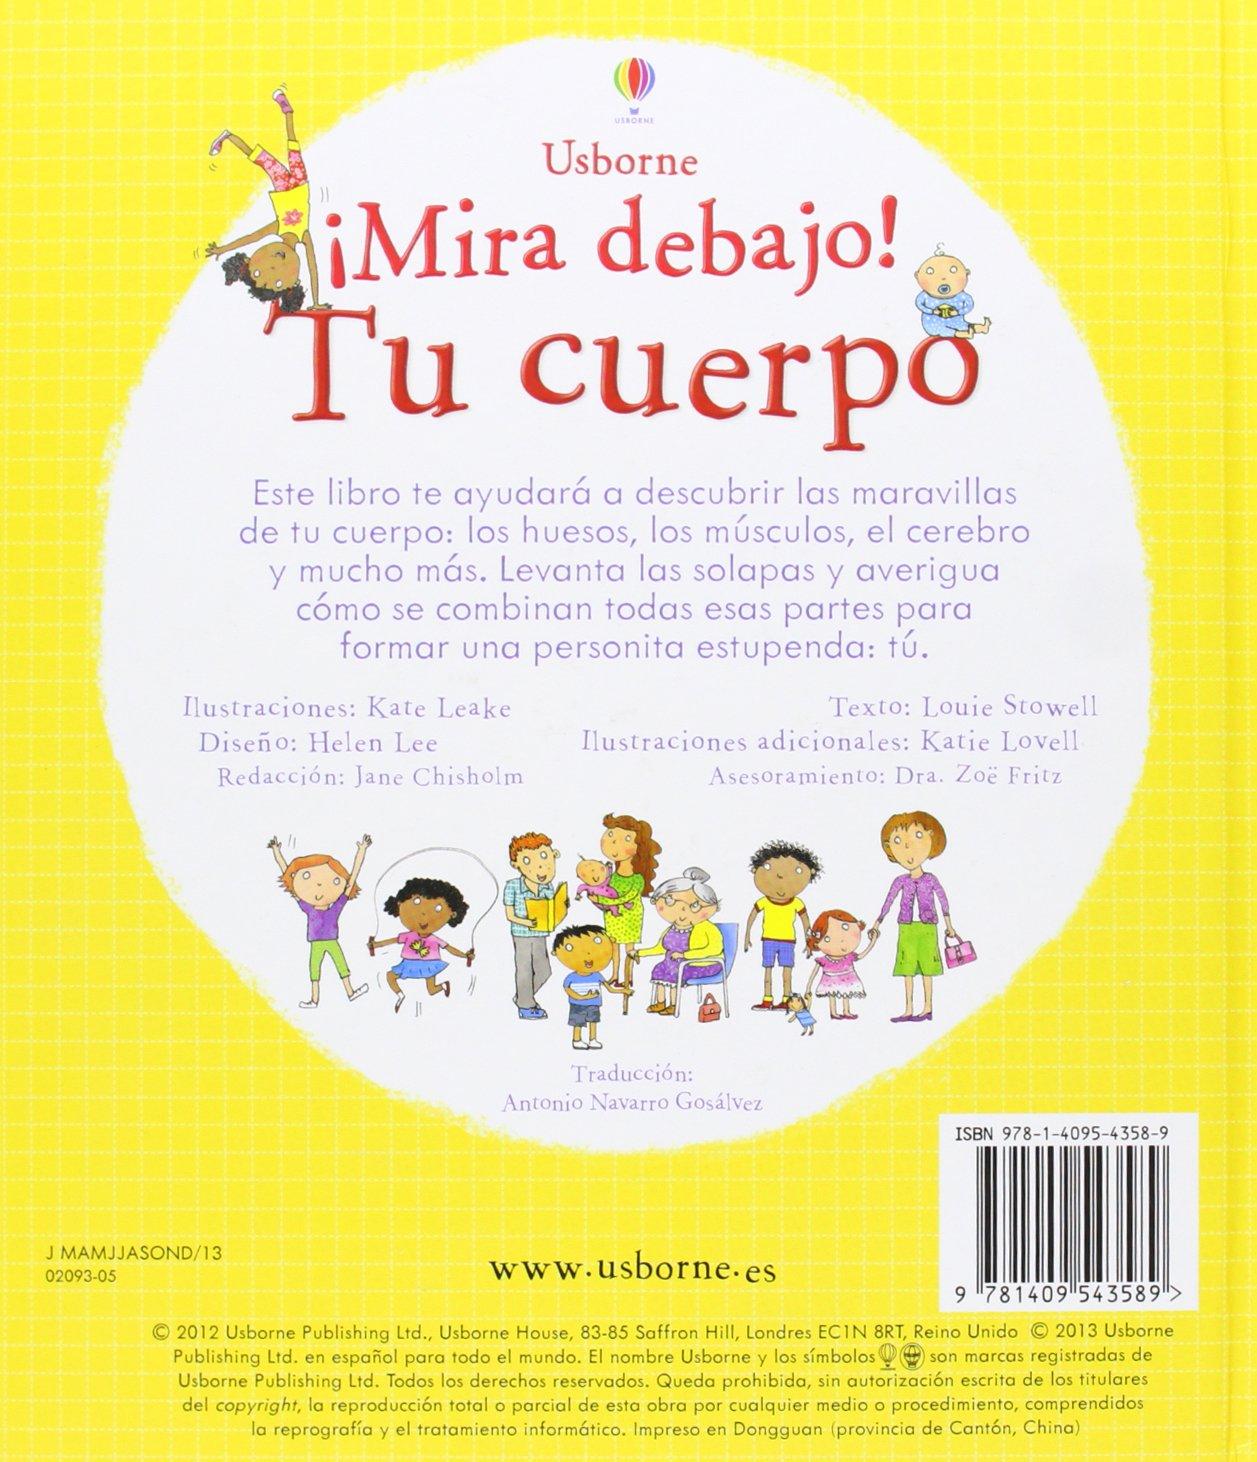 TU CUERPO MIRA DEBAJO: USBORNE PUBLISHING: 9781409543589: Amazon.com: Books